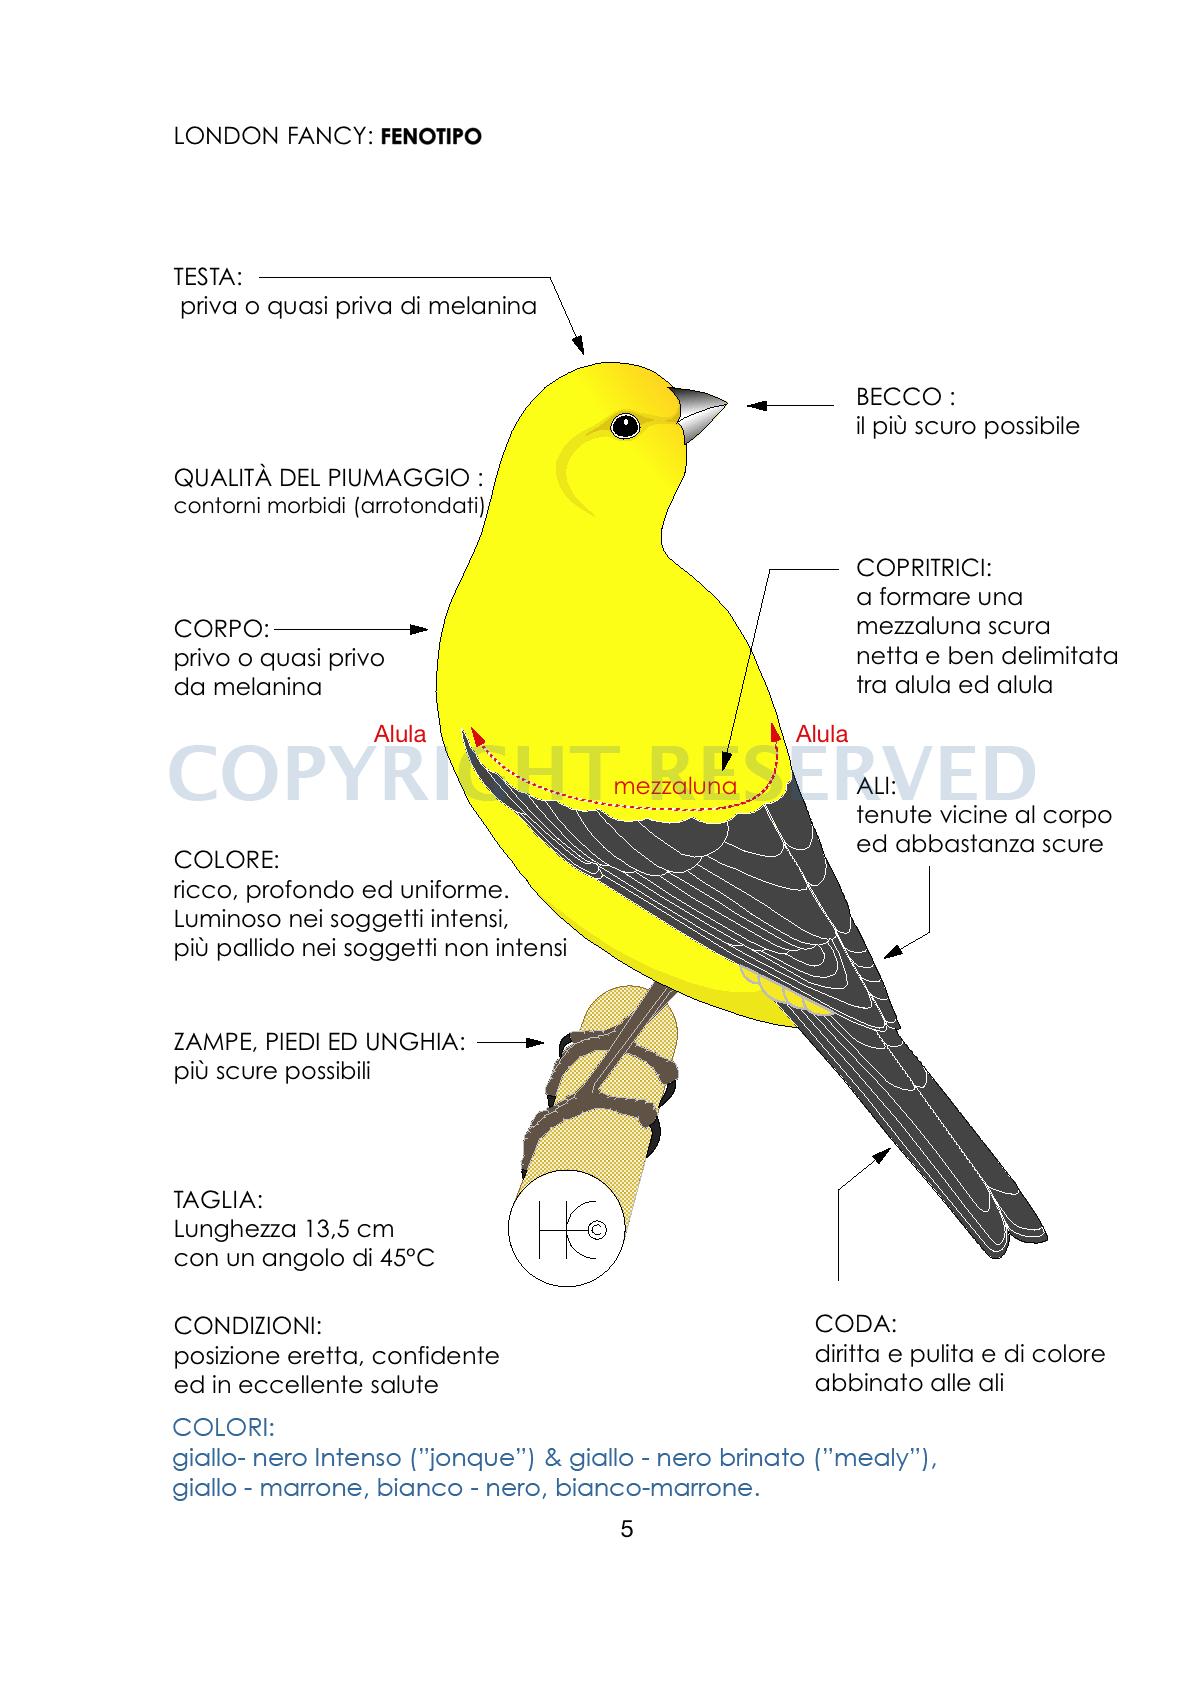 LF standard-phenotype ITALIAN